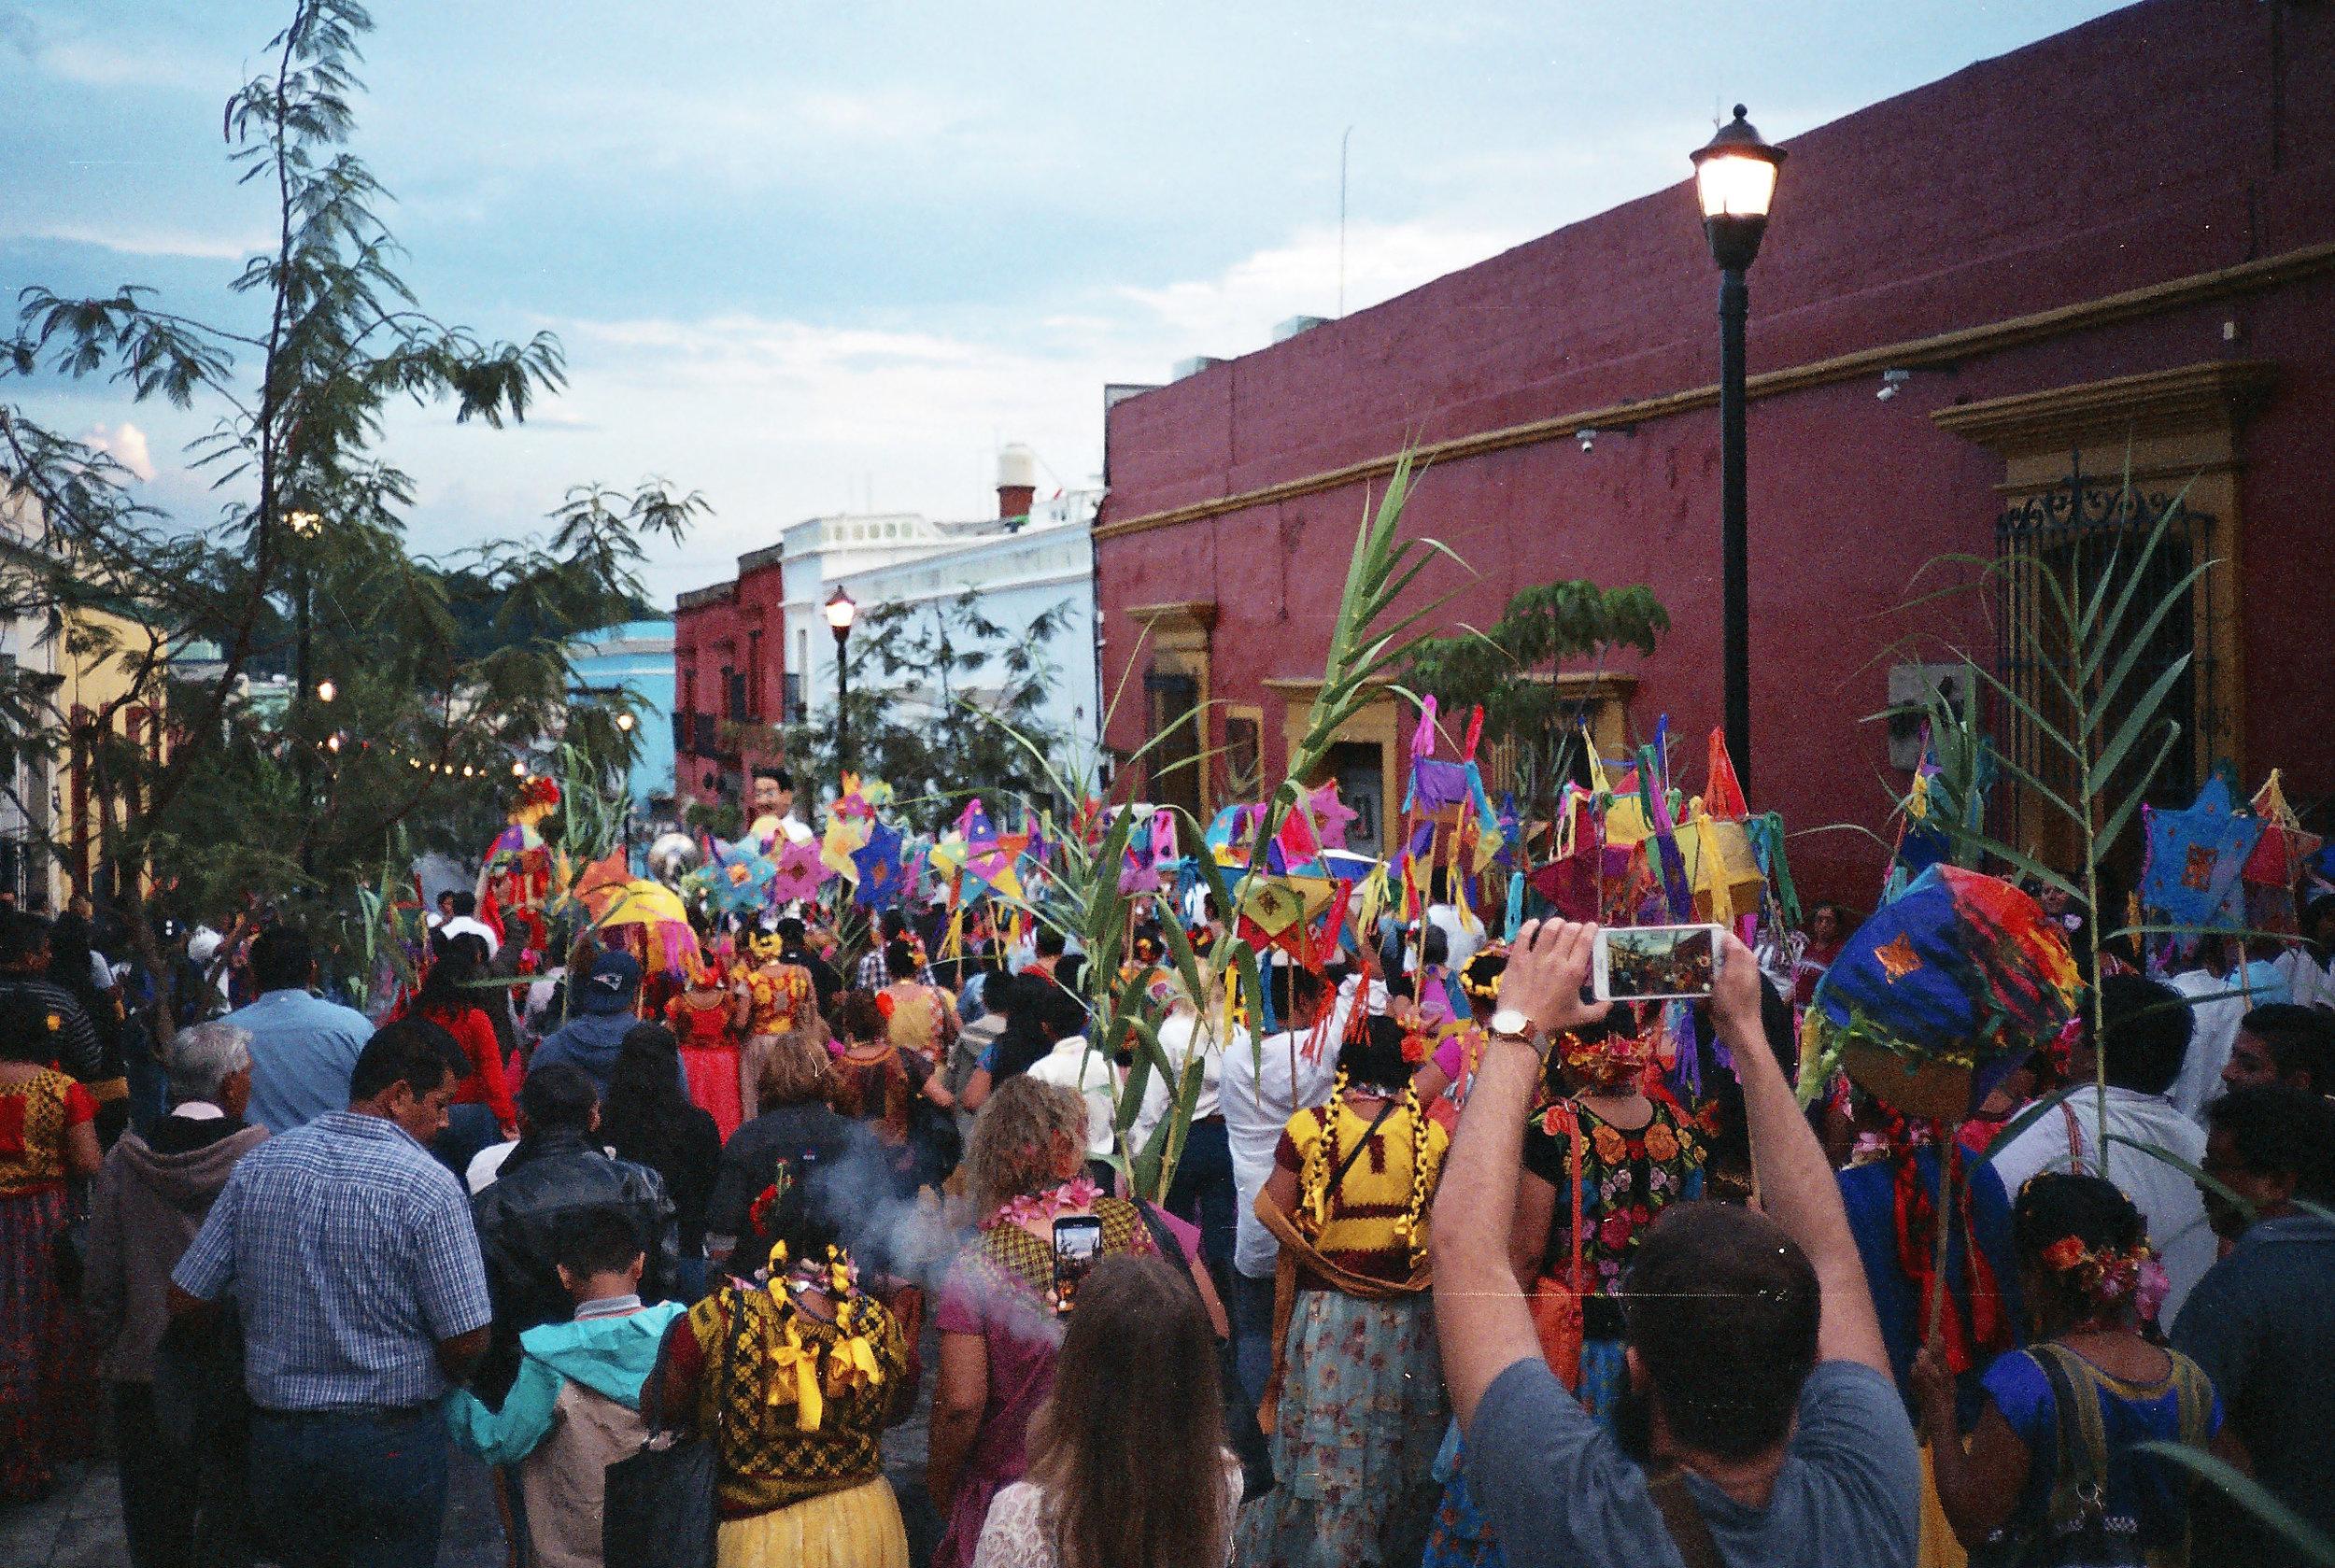 Centro District - Oaxaca de Juárez, Oaxaca